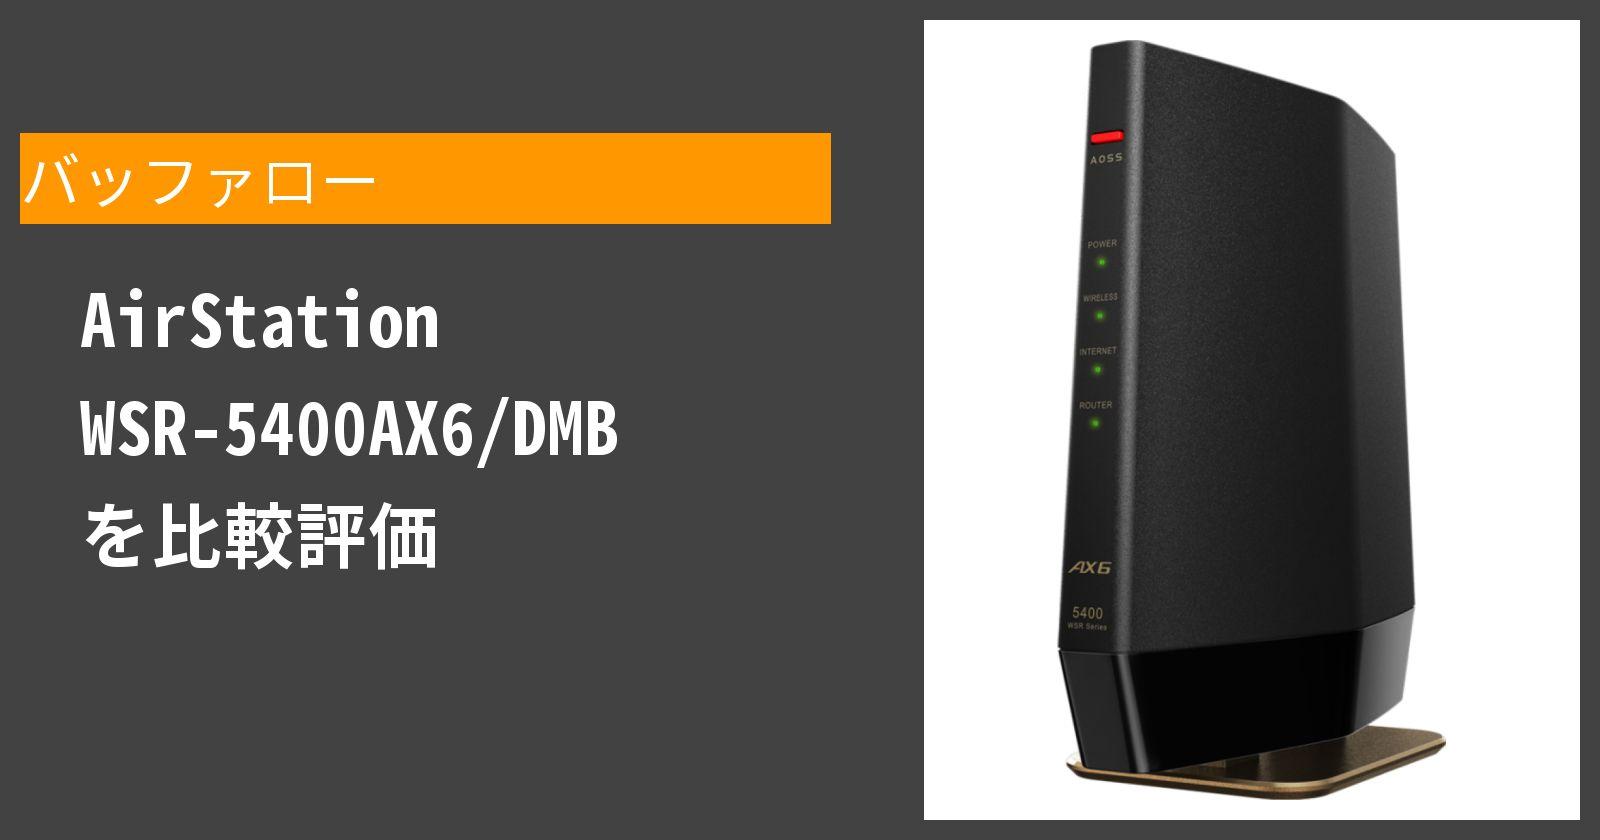 AirStation WSR-5400AX6/DMBを徹底評価